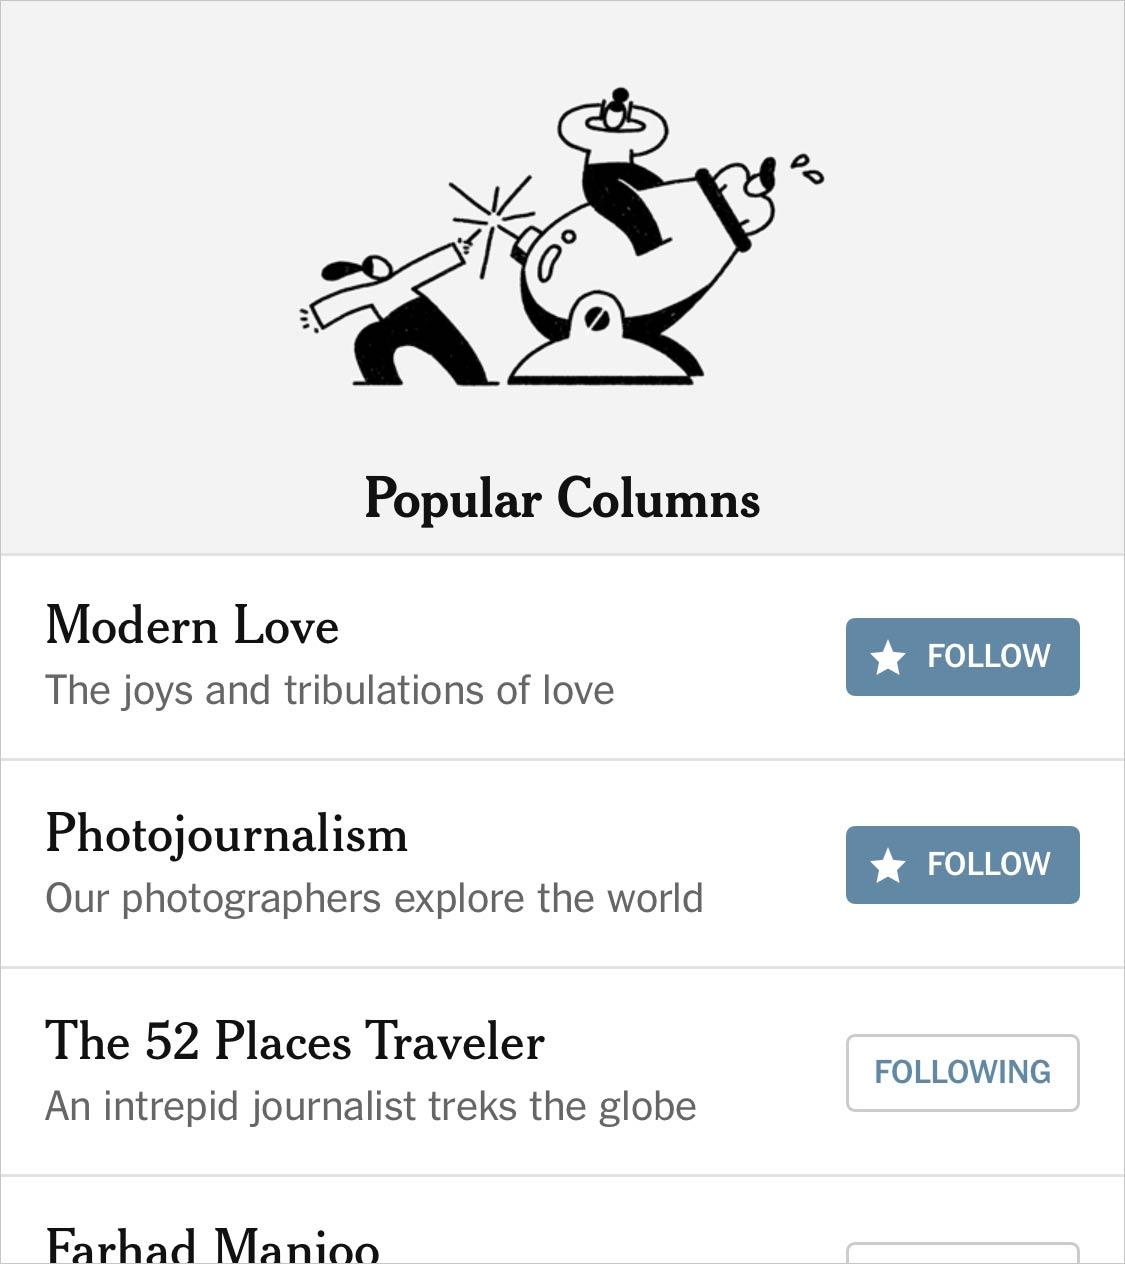 PopularColumns.jpg